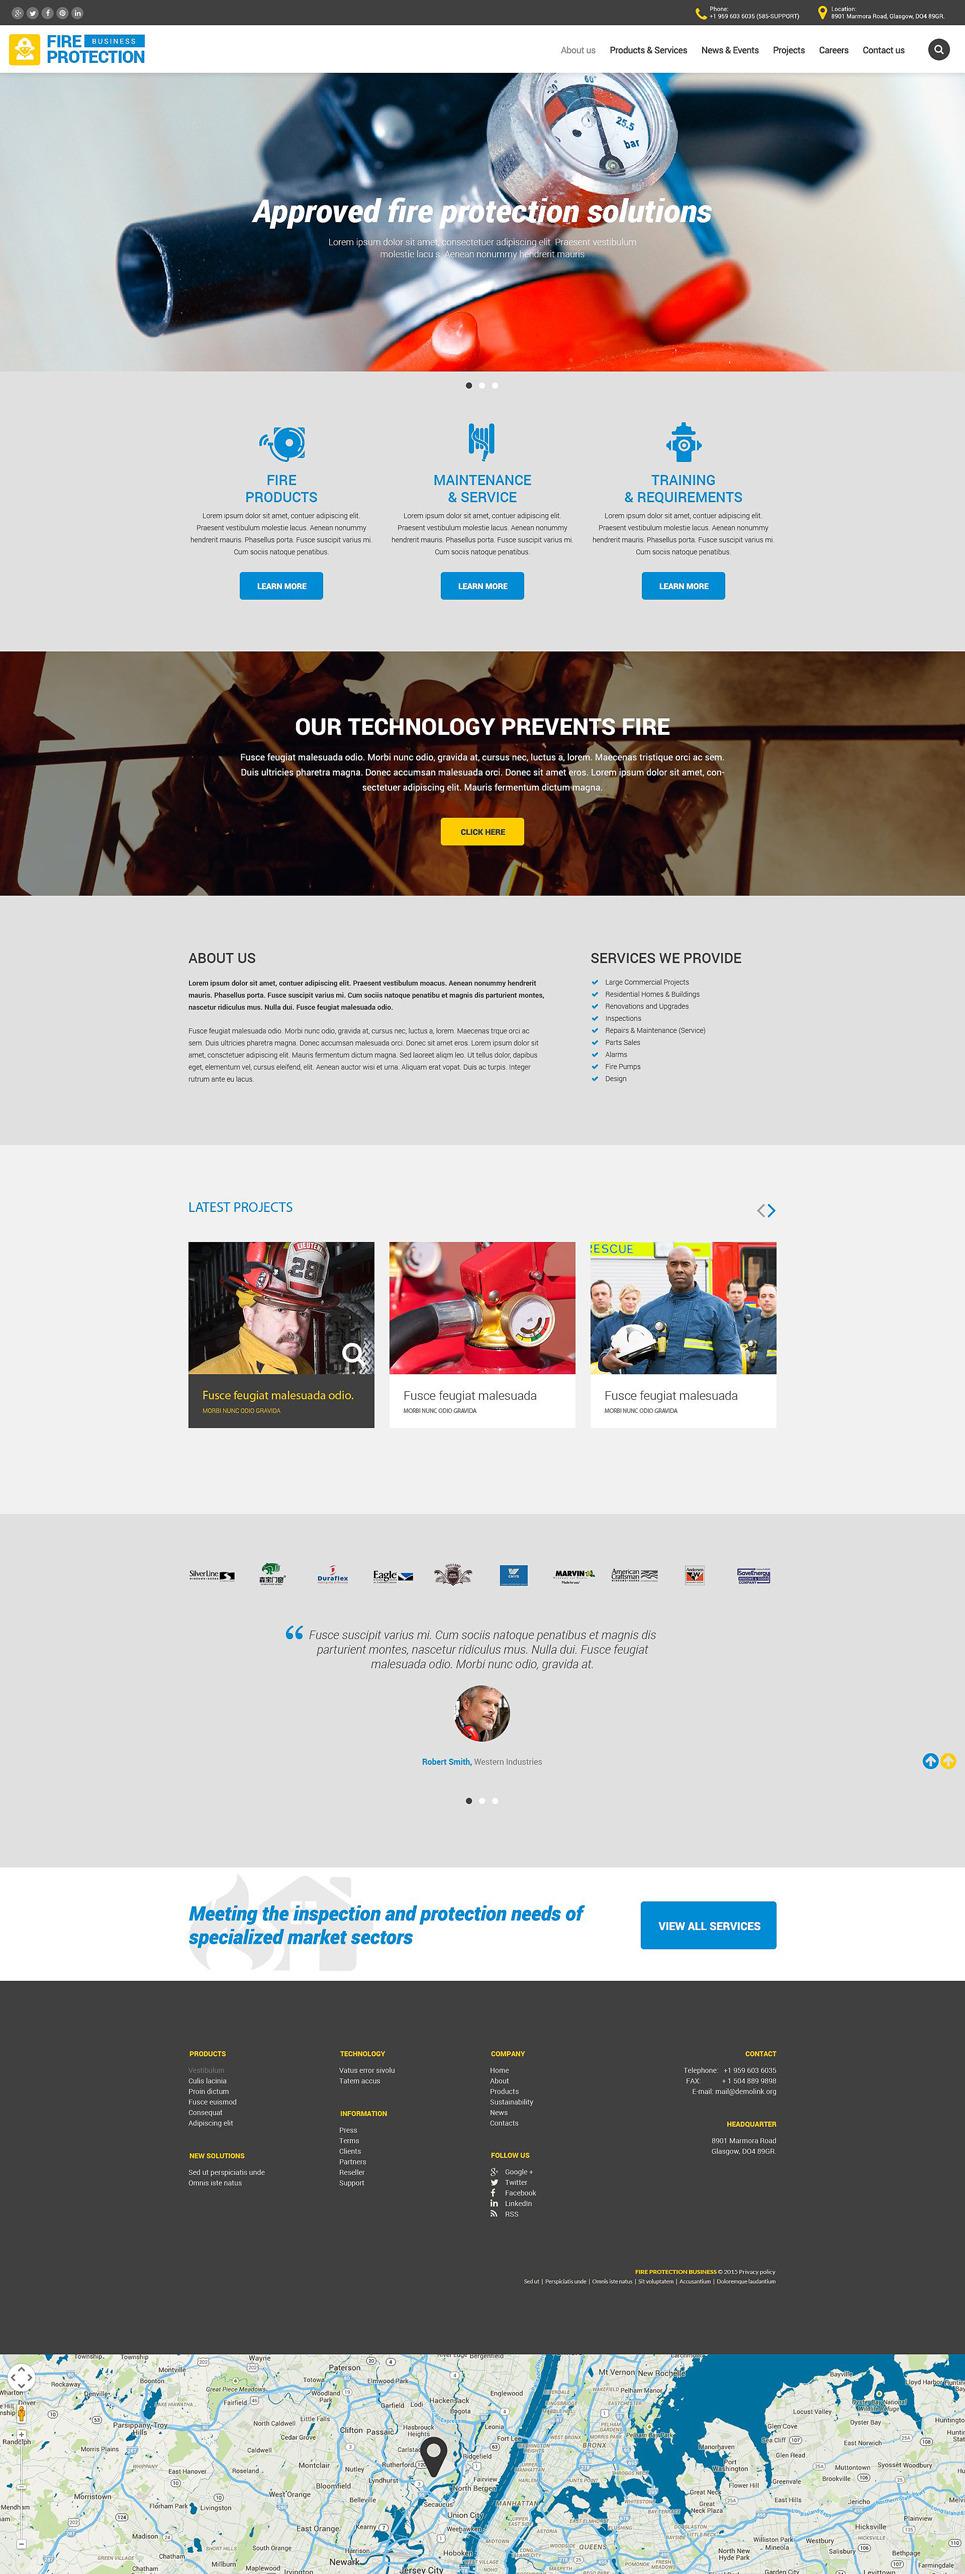 Fire Protection Business Website Template New Screenshots BIG